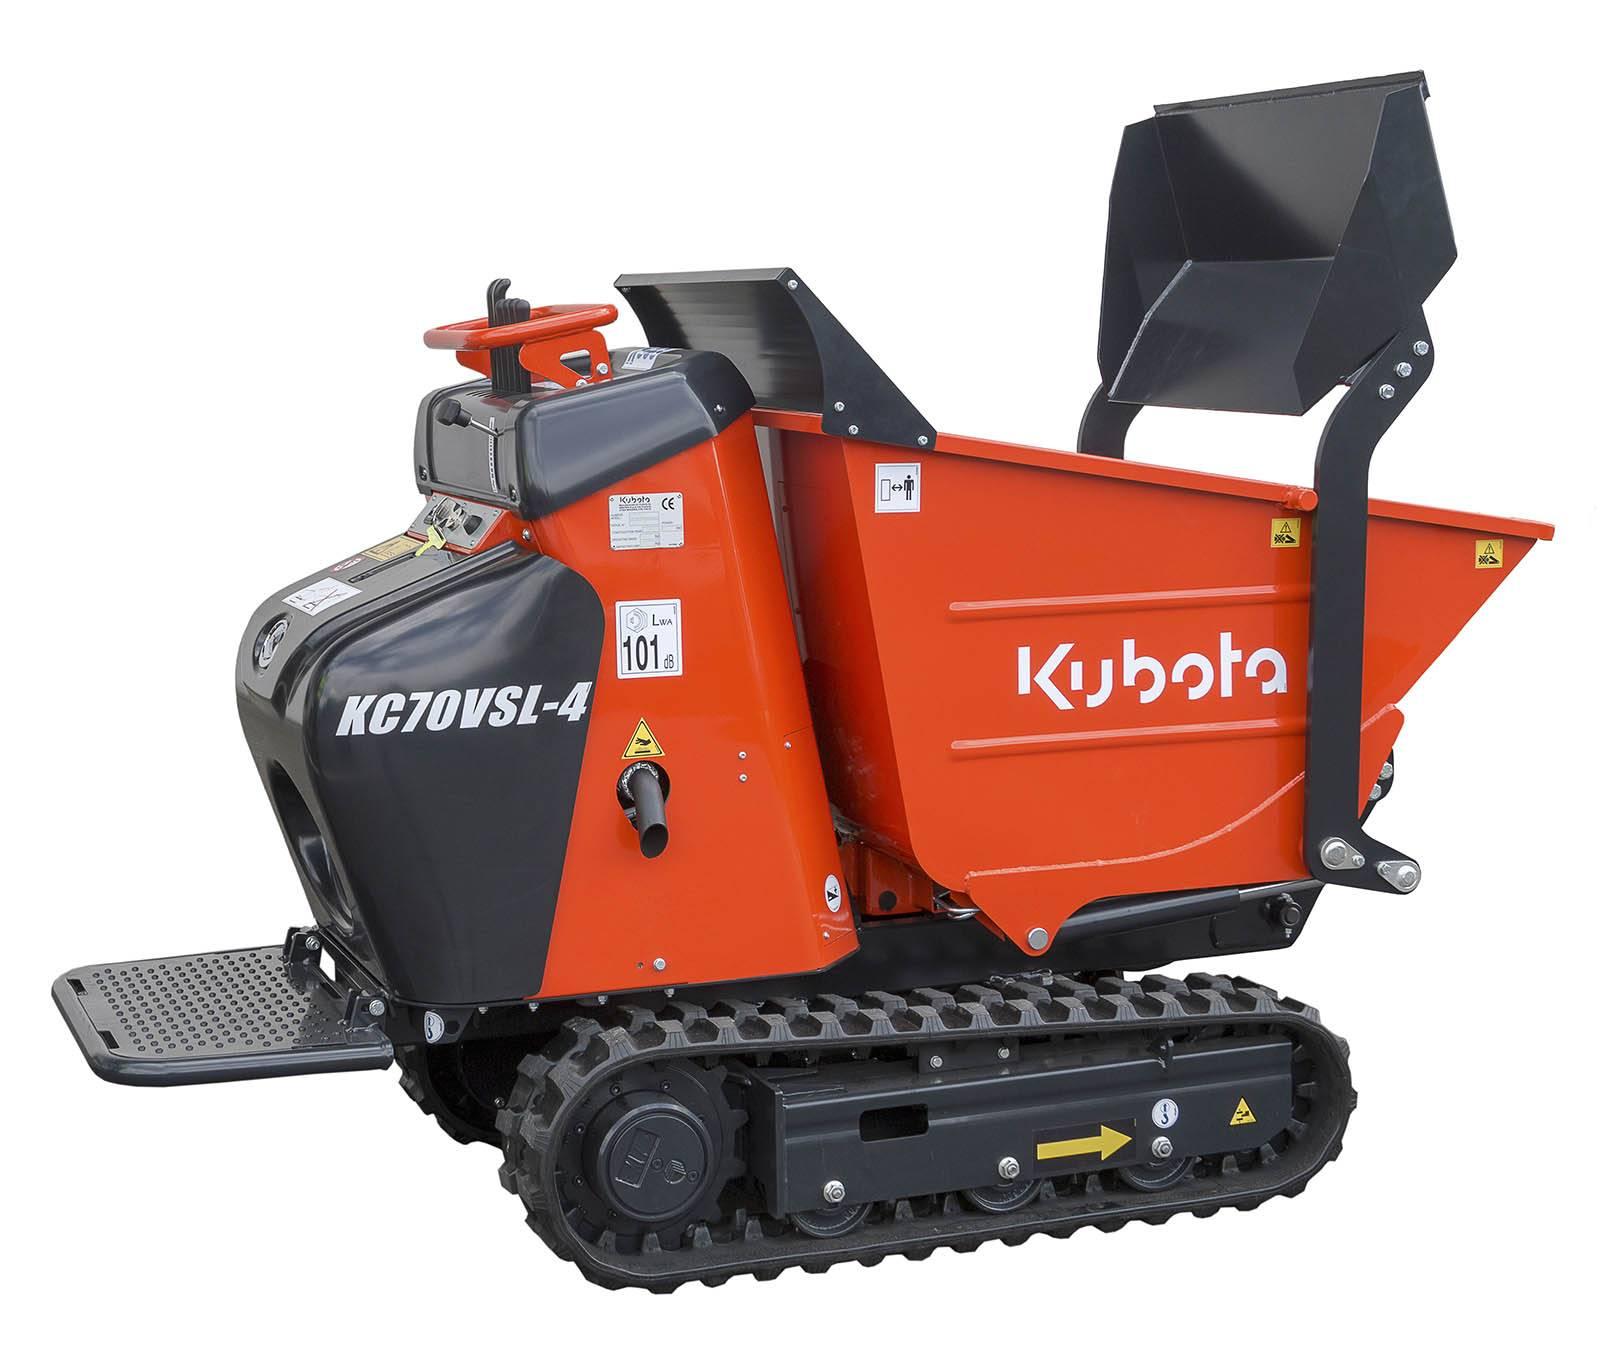 Kubota KC70 VSL-4